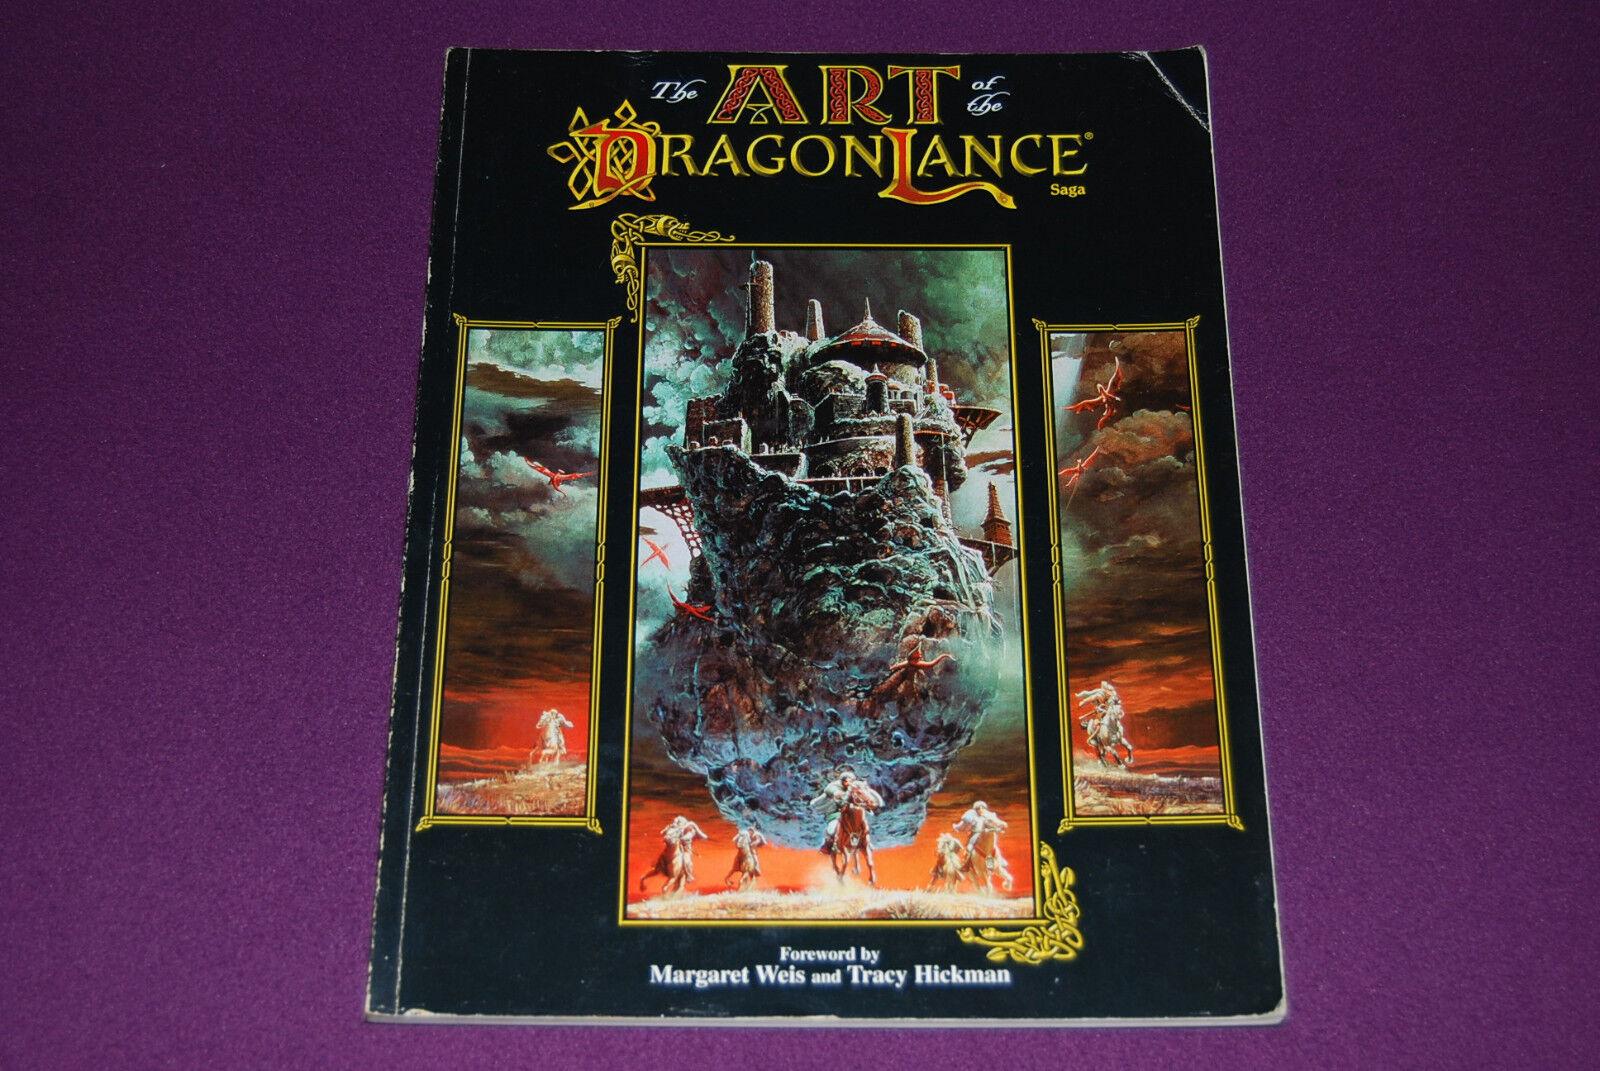 AD&D RPG JDR Jeu de Role - Dragonlance   The Art of the Dragonlance Saga 2nd Ed.